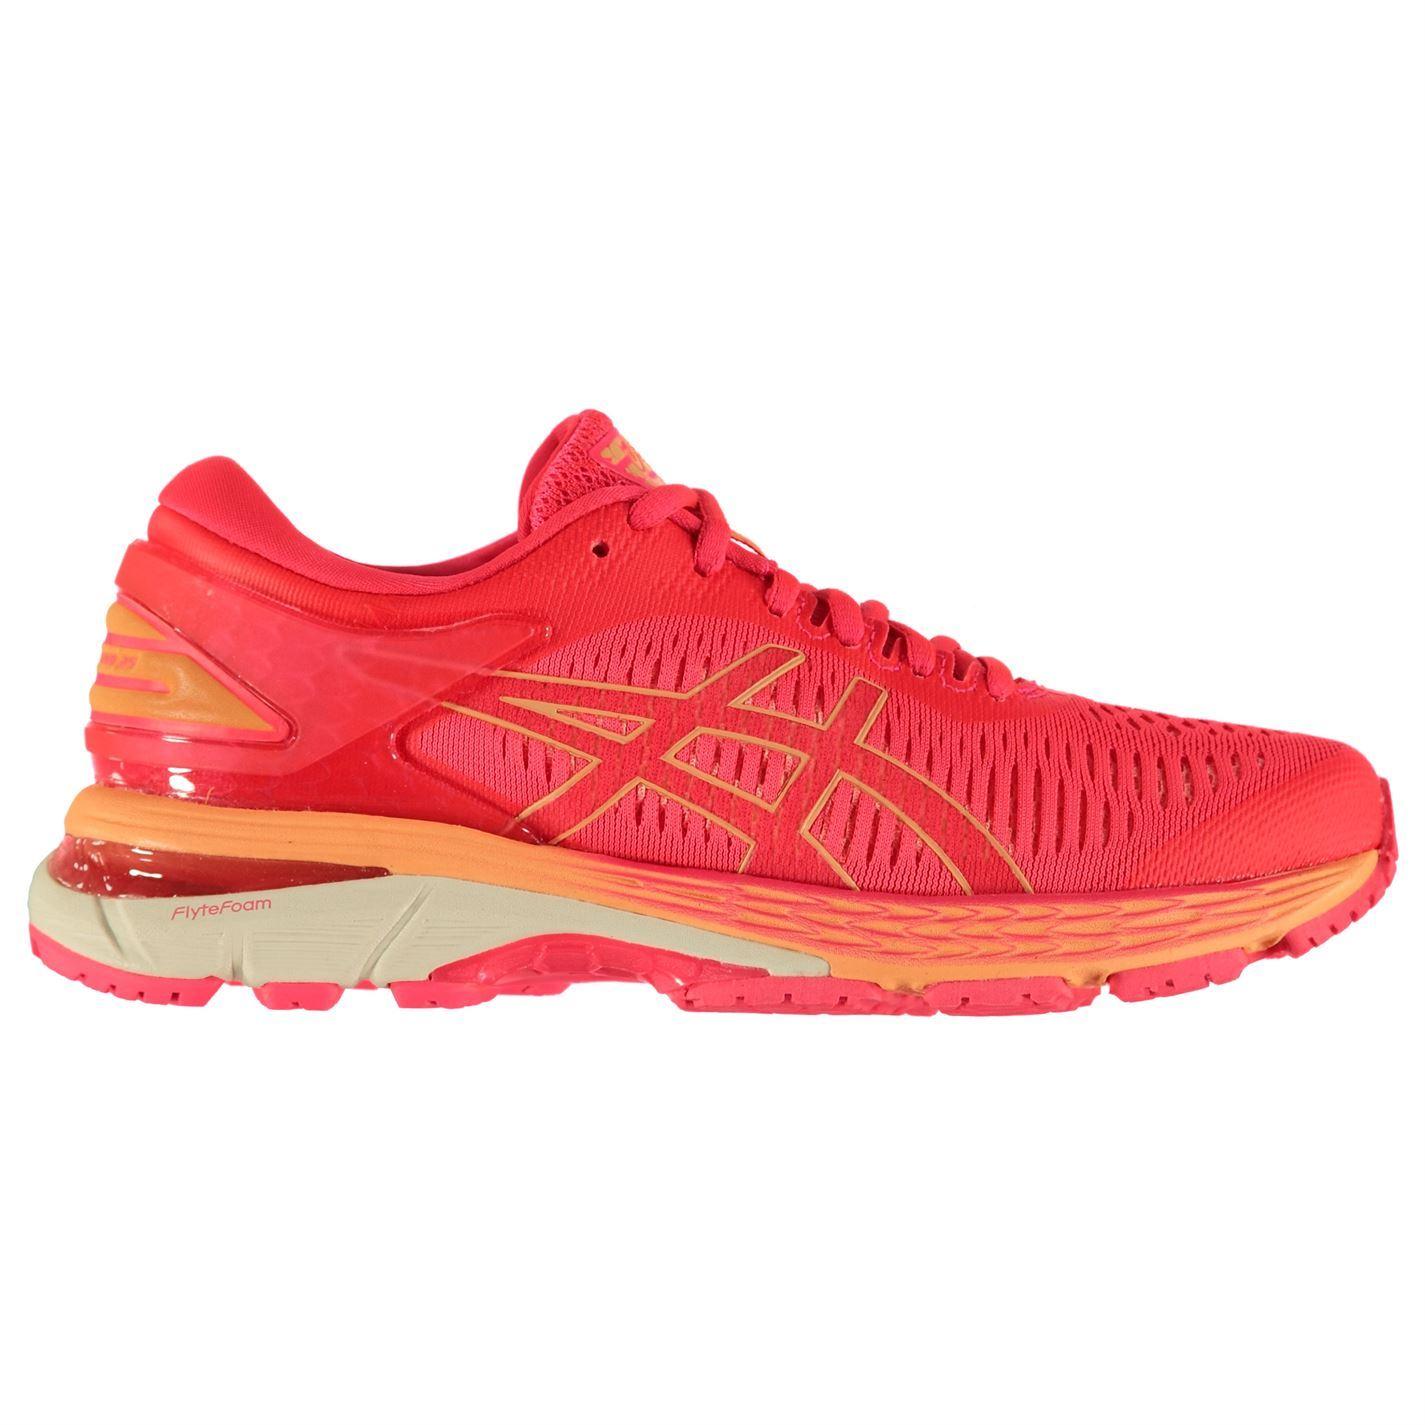 Asics Gel Kayano Kayano Gel 25 Running Schuhes Road Damenschuhe 7b351d